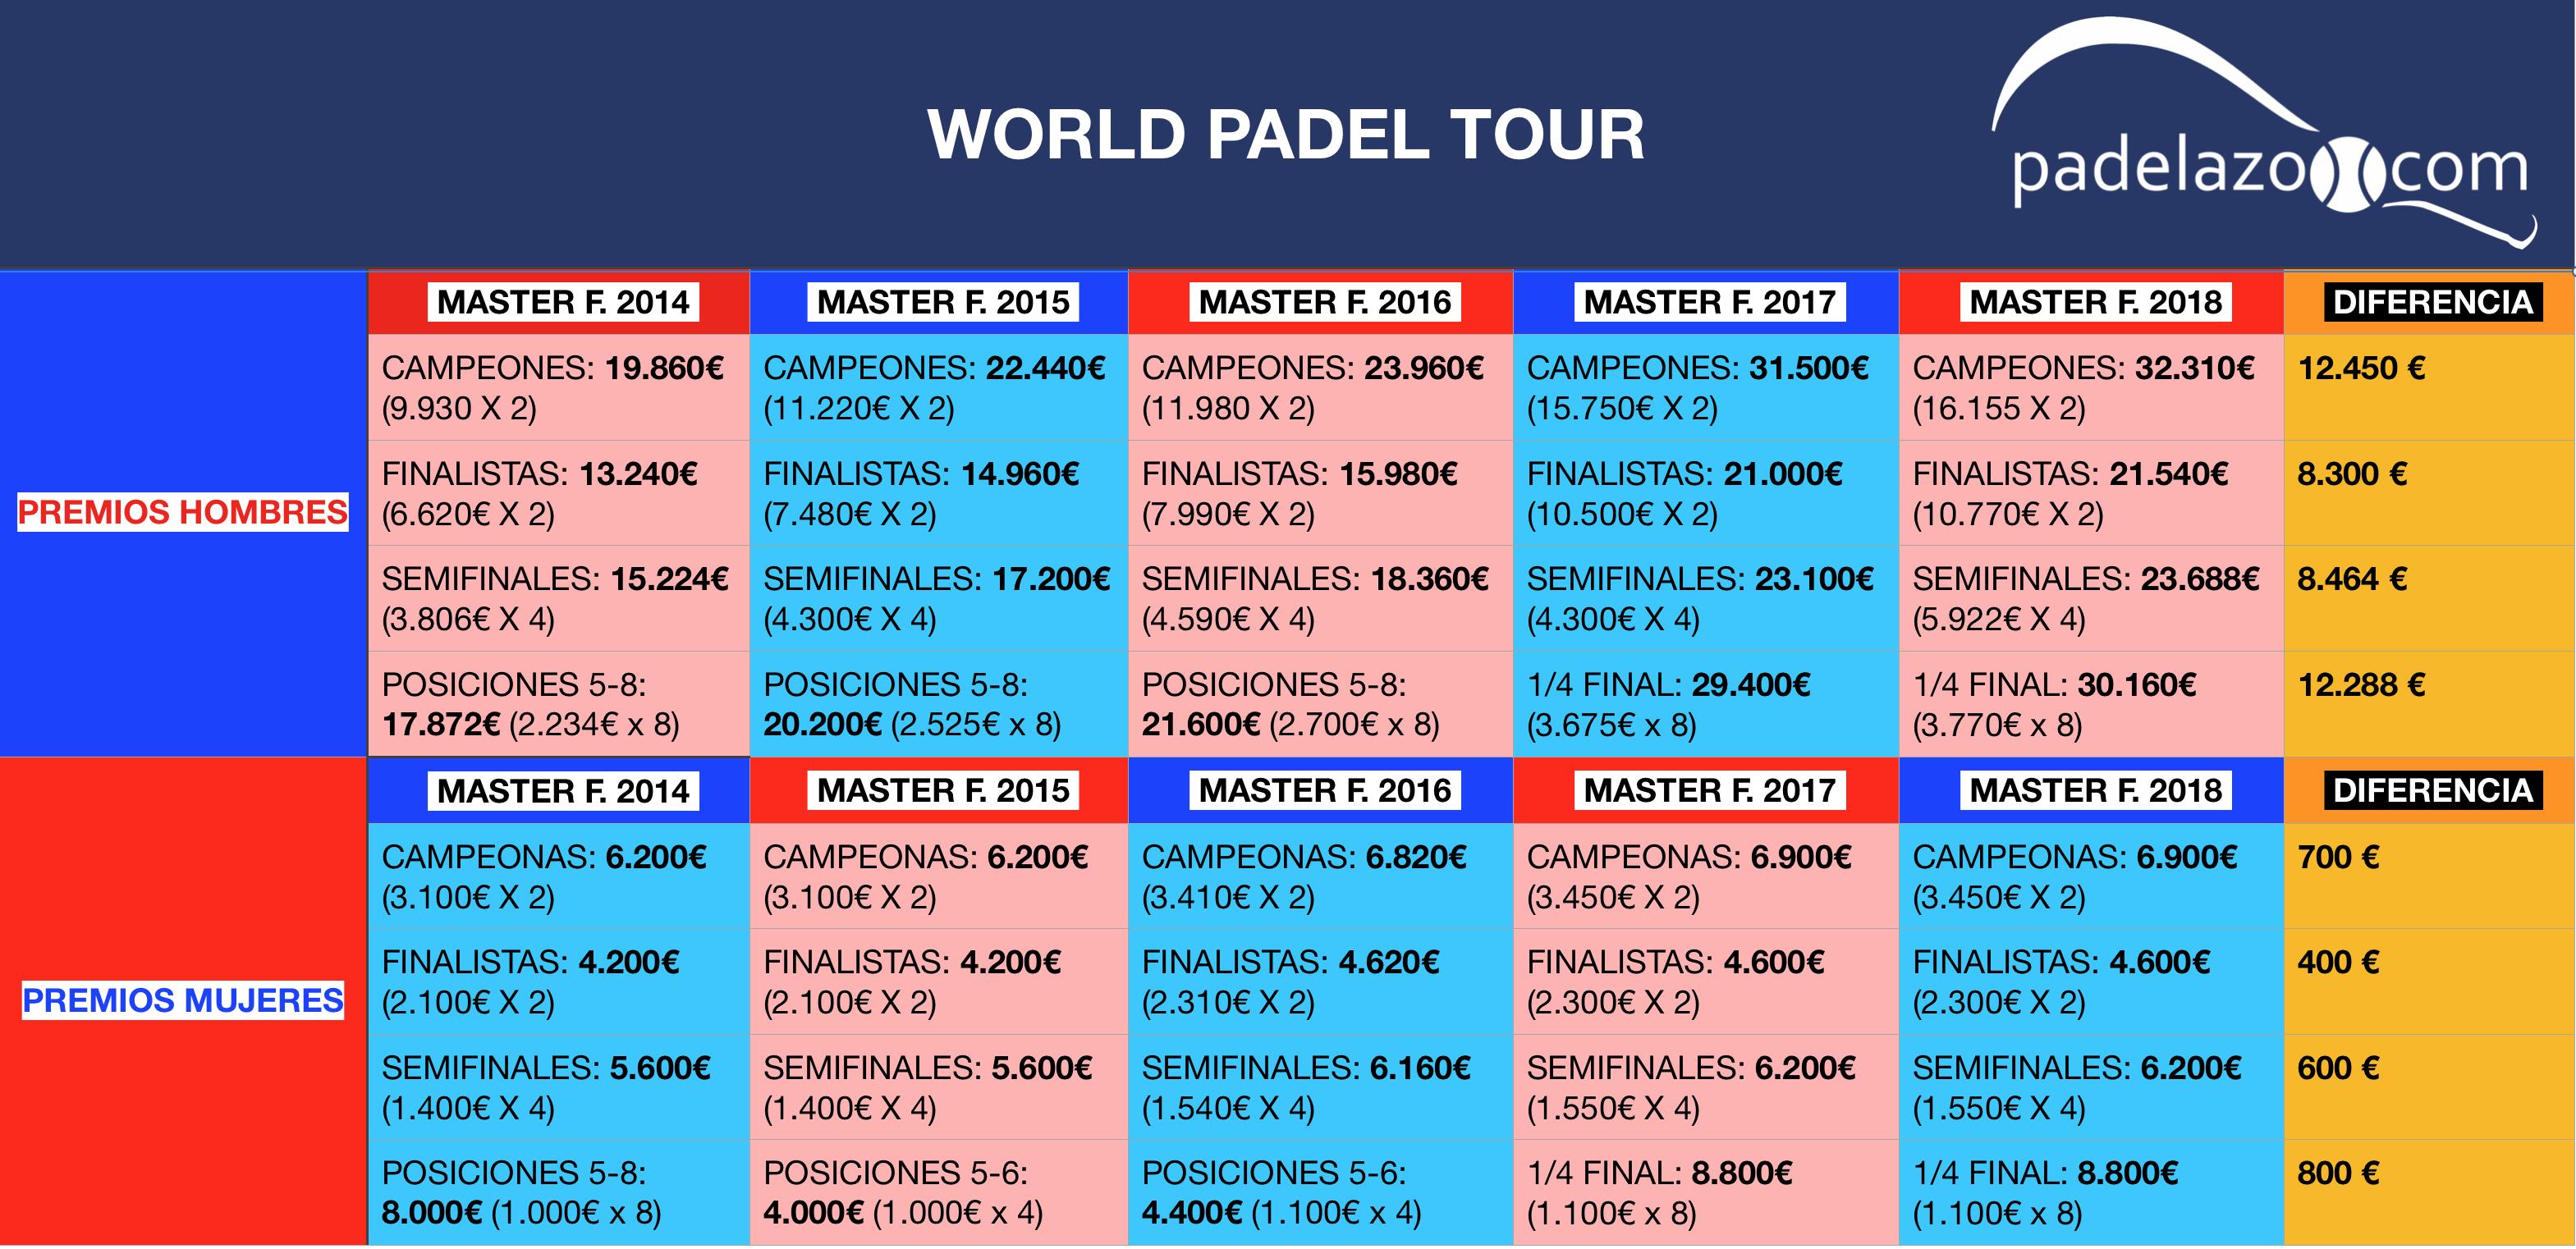 comparativa premios master final world padel tour masculino y femenino 2018